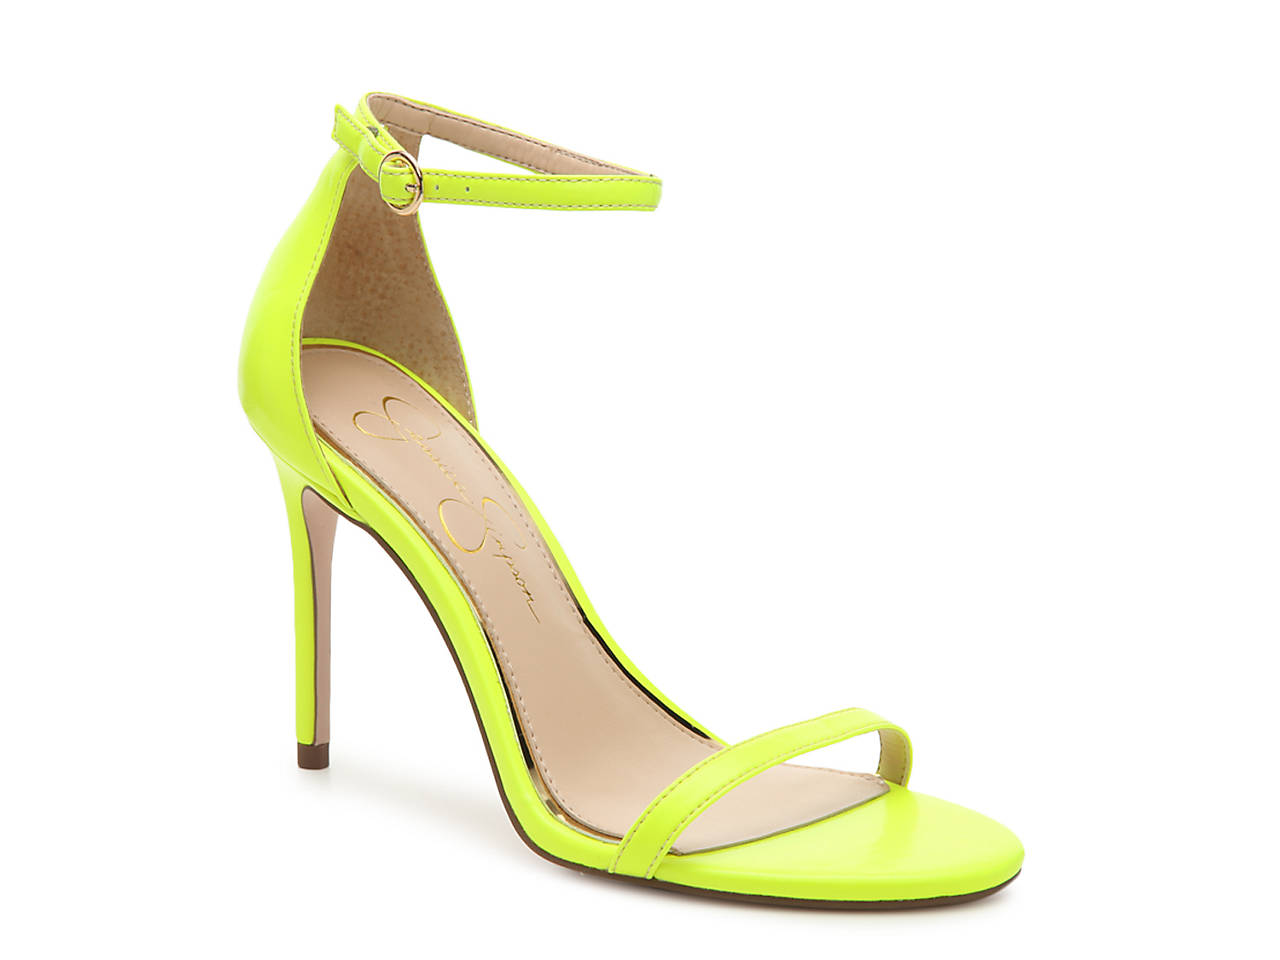 93632944ddb Jessica Simpson Eveena Sandal Women s Shoes